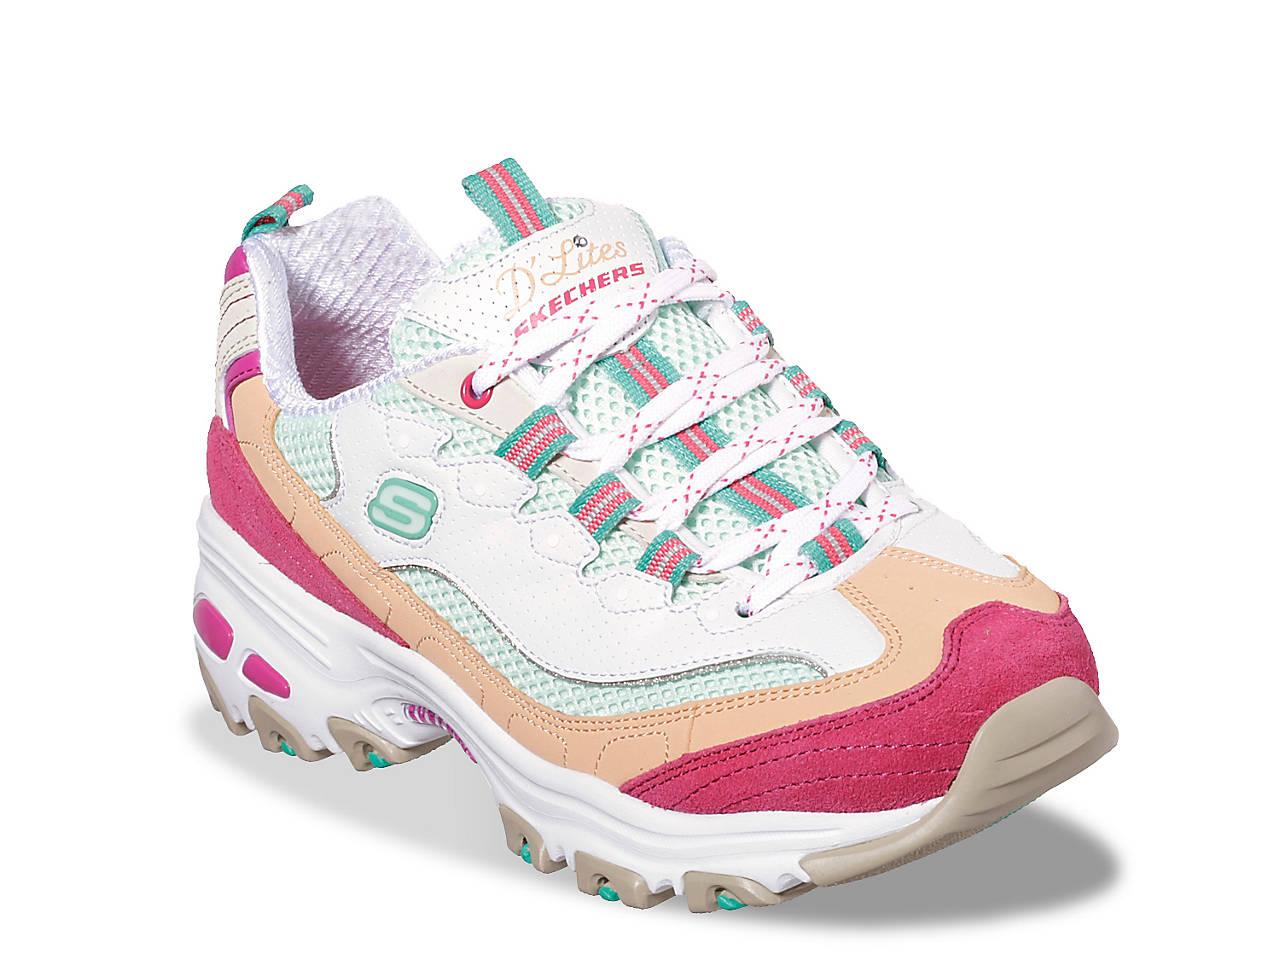 skechers multi colored sneakers